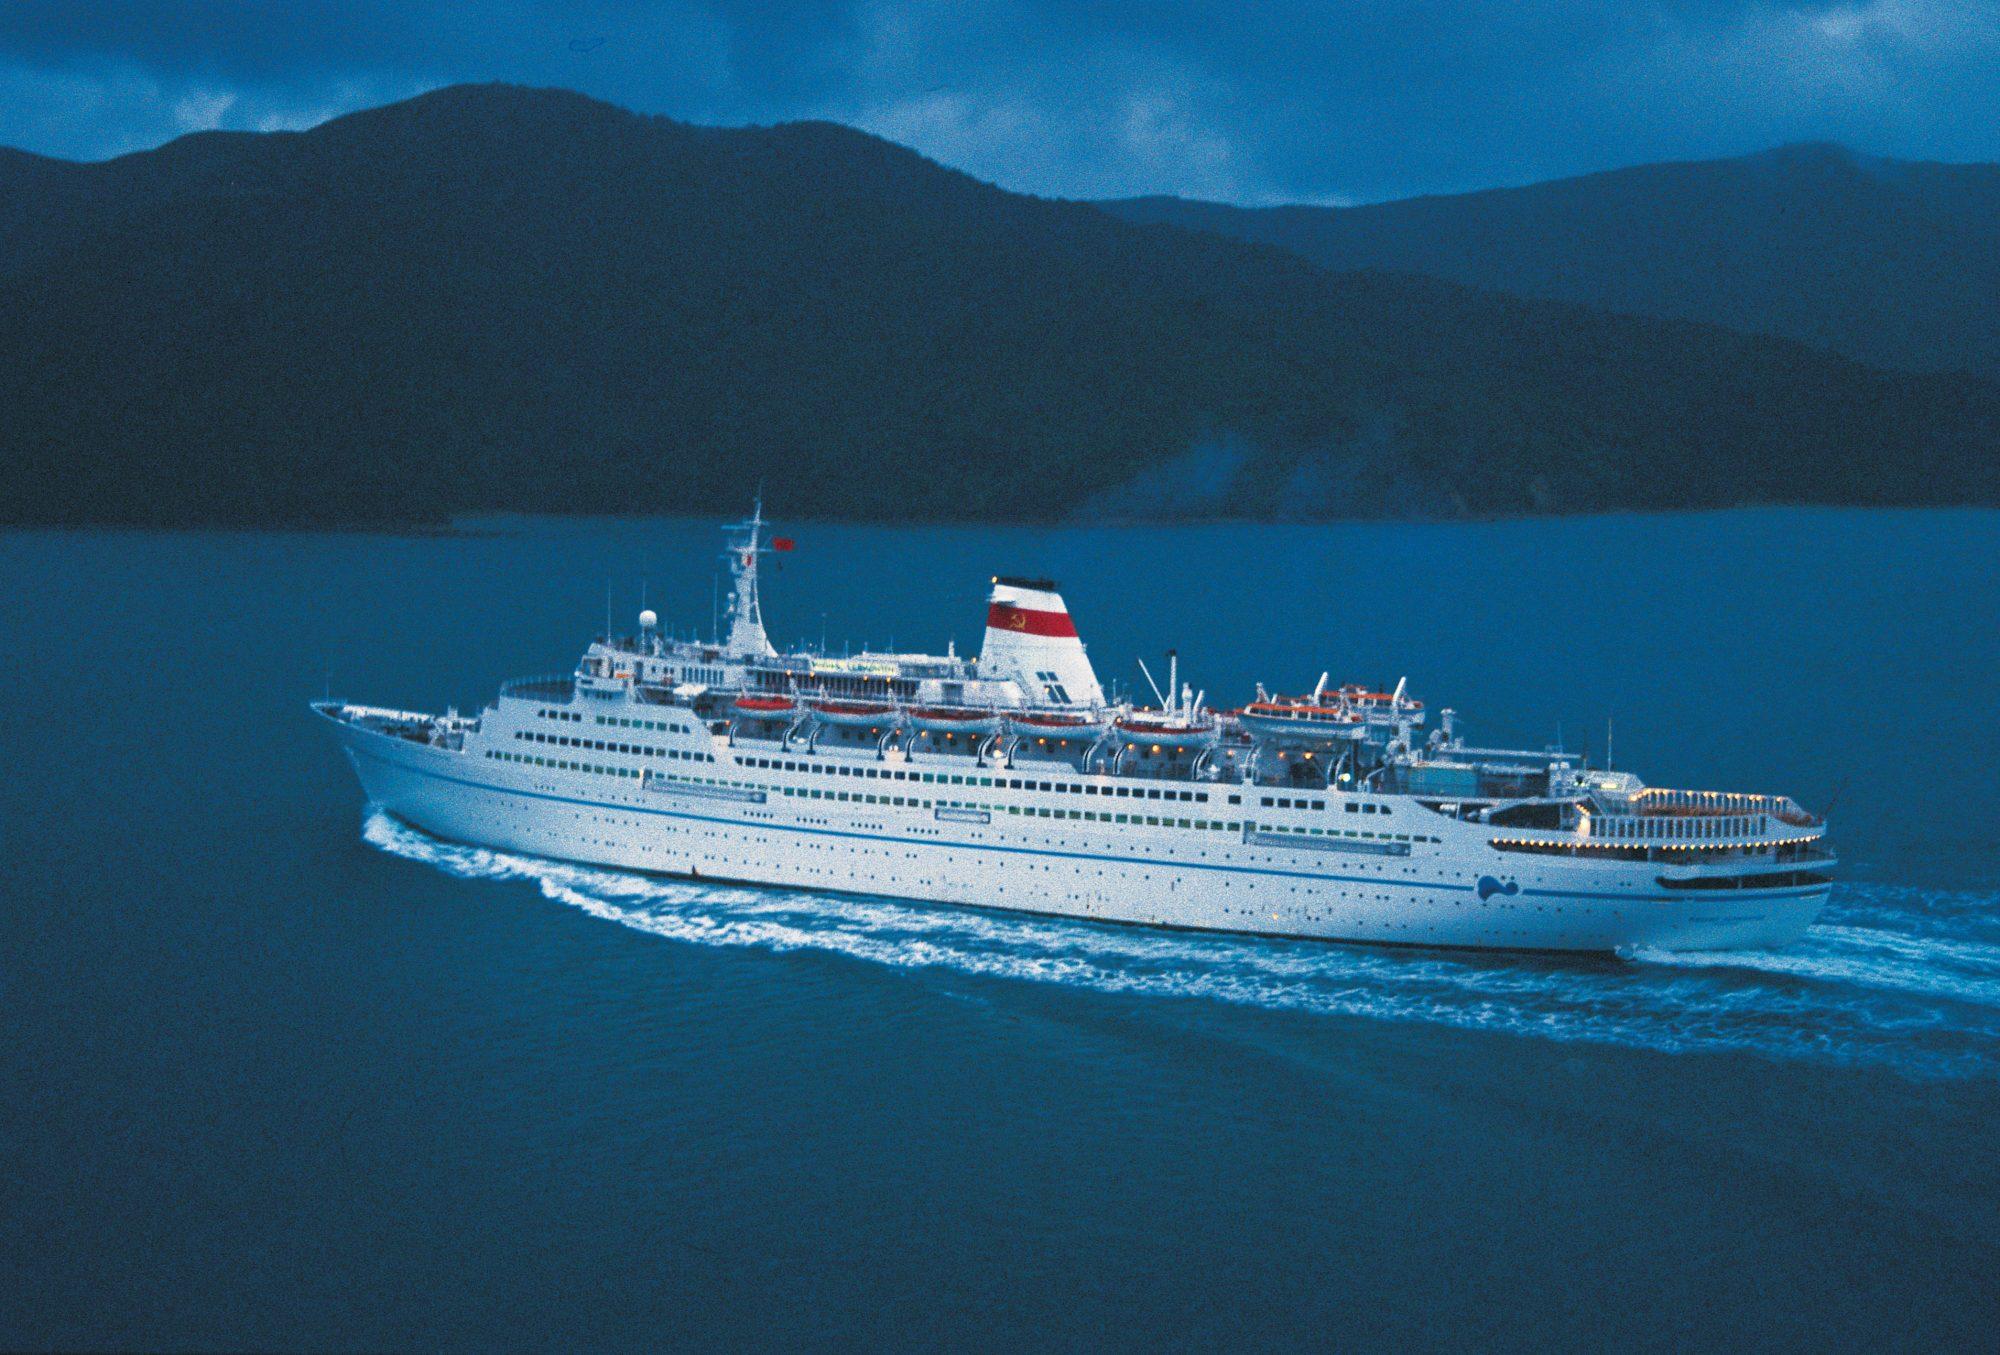 Mikhail Lermontov cruise ship